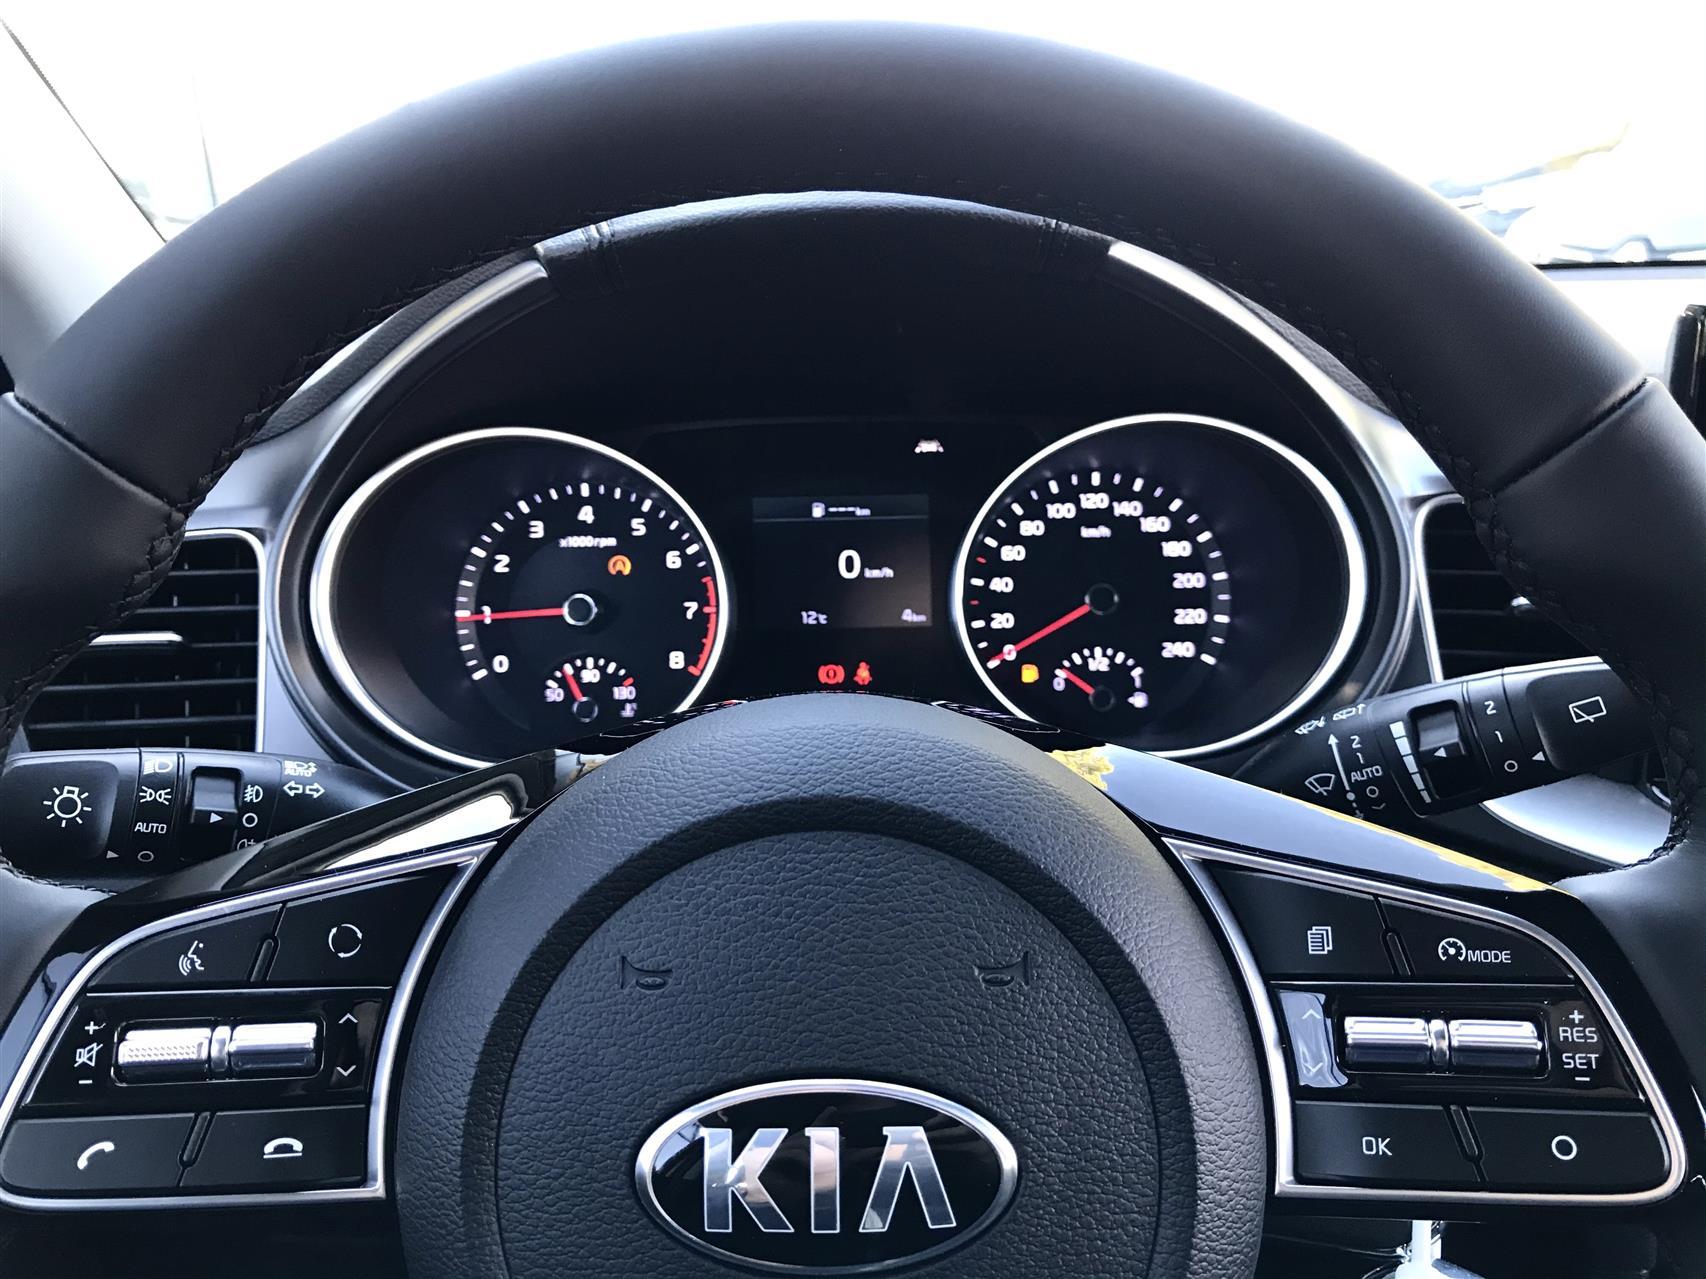 Billede af Kia XCeed 1,0 T-GDI Active 120HK 5d